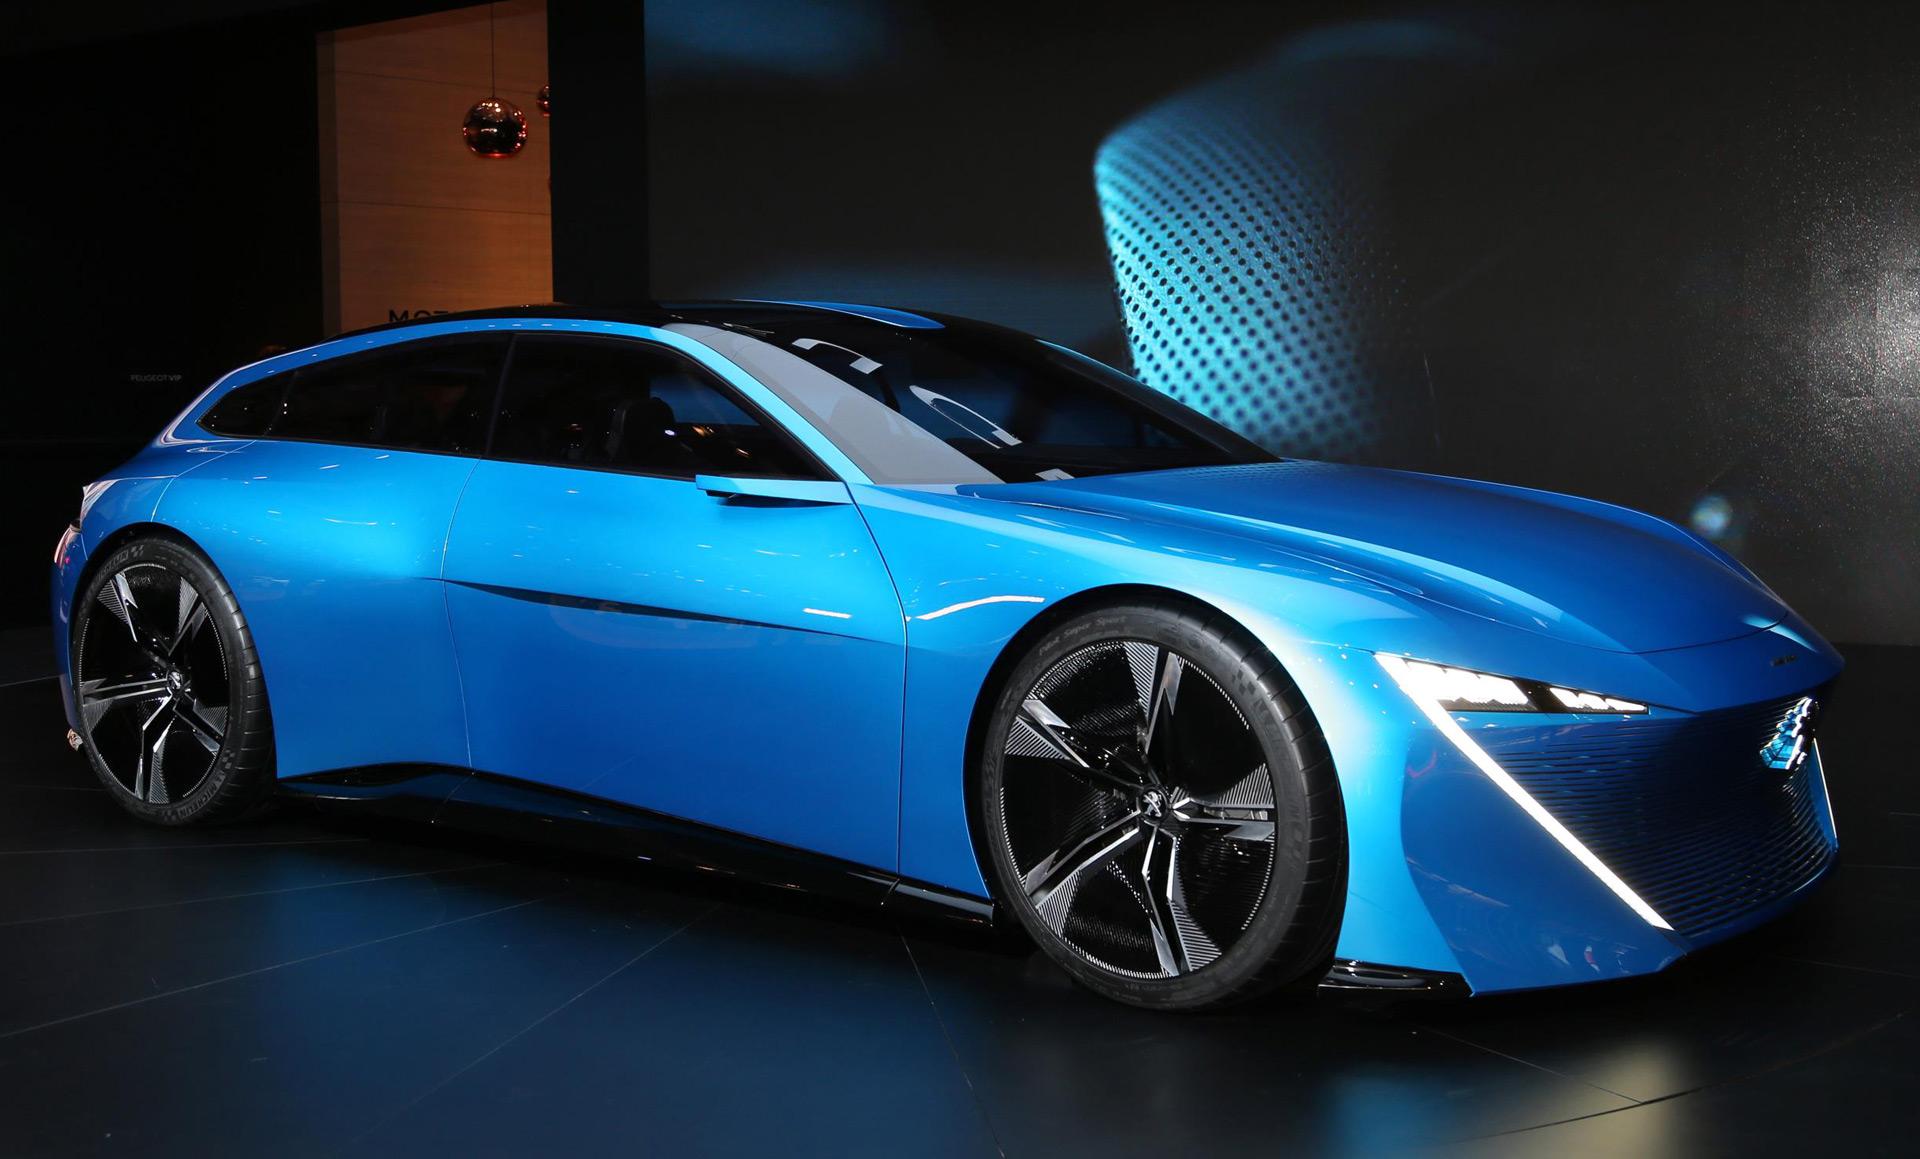 peugeot instinct concept previews hybrid  driving technologies